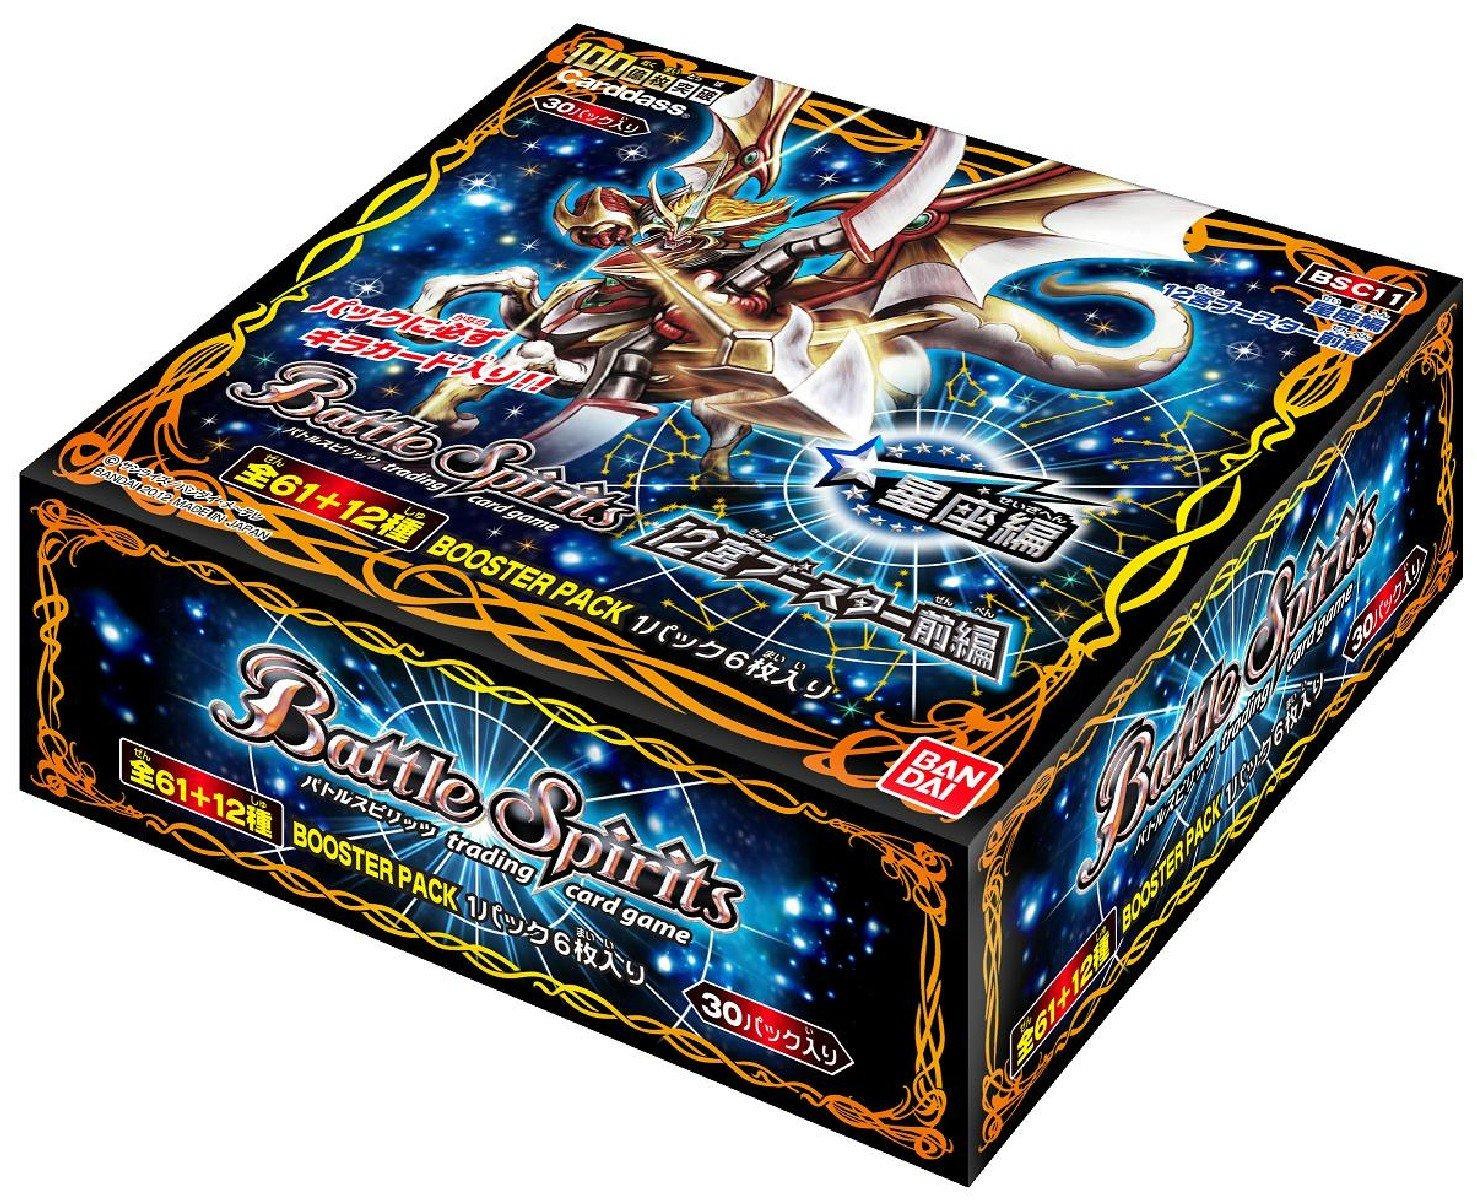 Battle Spirits Constellation - 12 Constellation Part.1 Booster Pack [BSC11] (30packs)